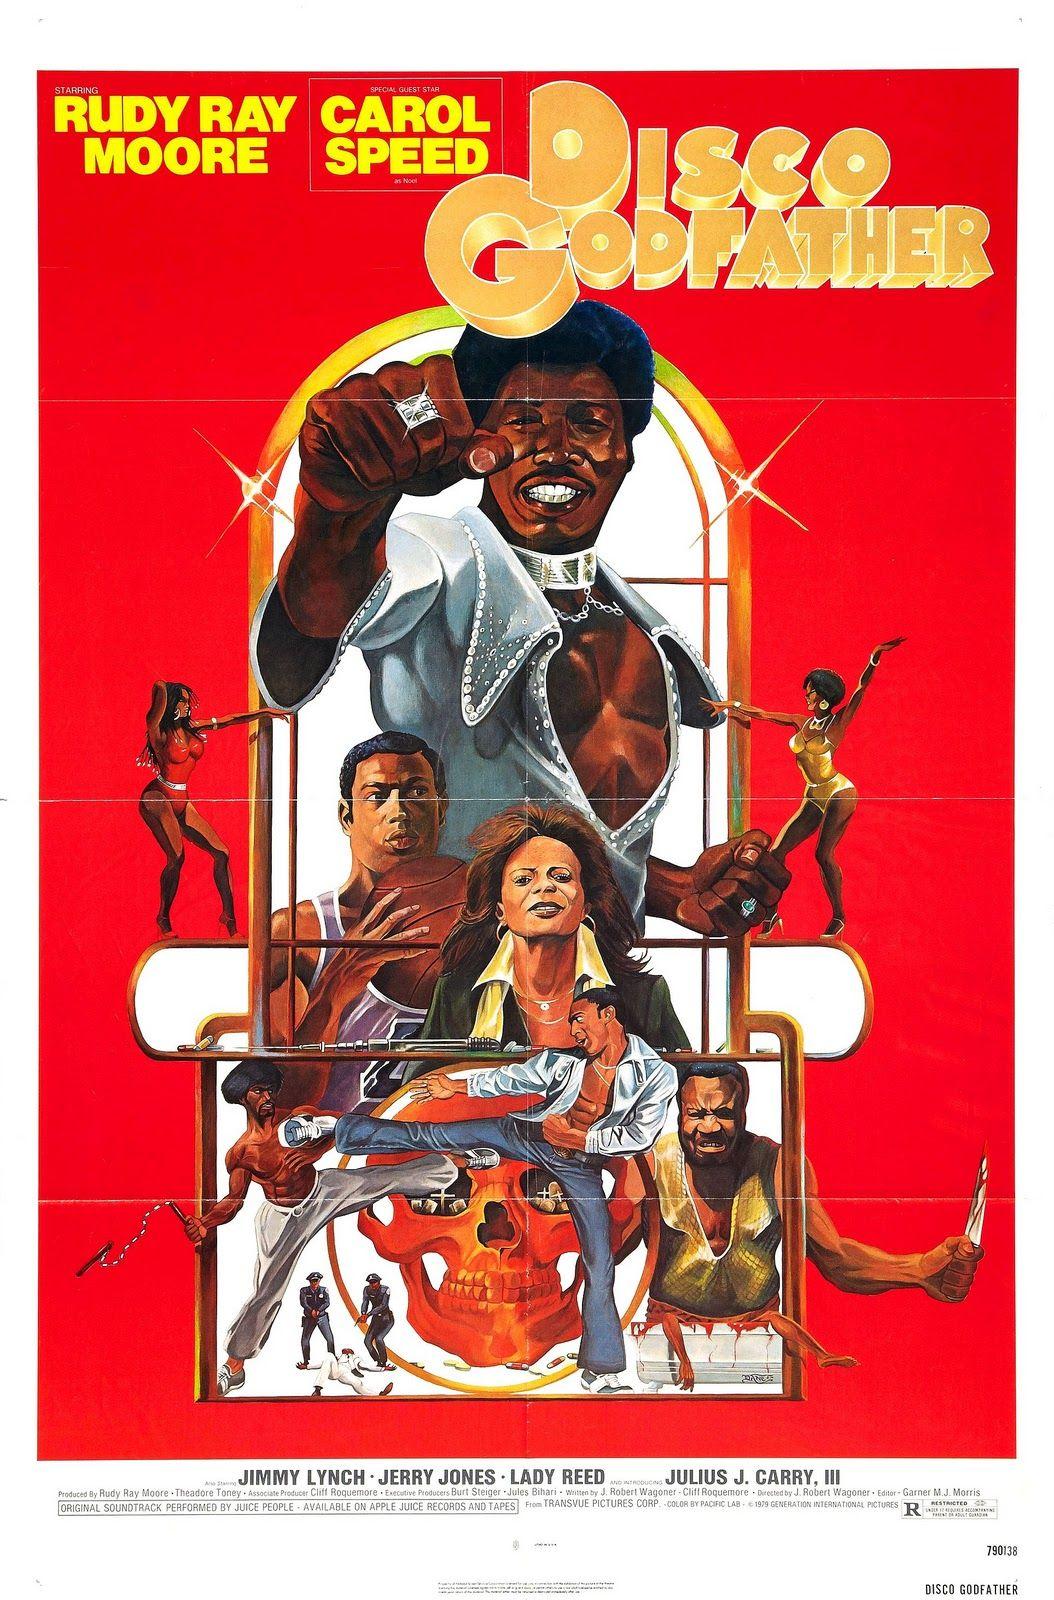 Disco Godfather Movie Blaxploitation 70s Poster Exploitation Blaxploitation Film Godfather Movie Movie Posters